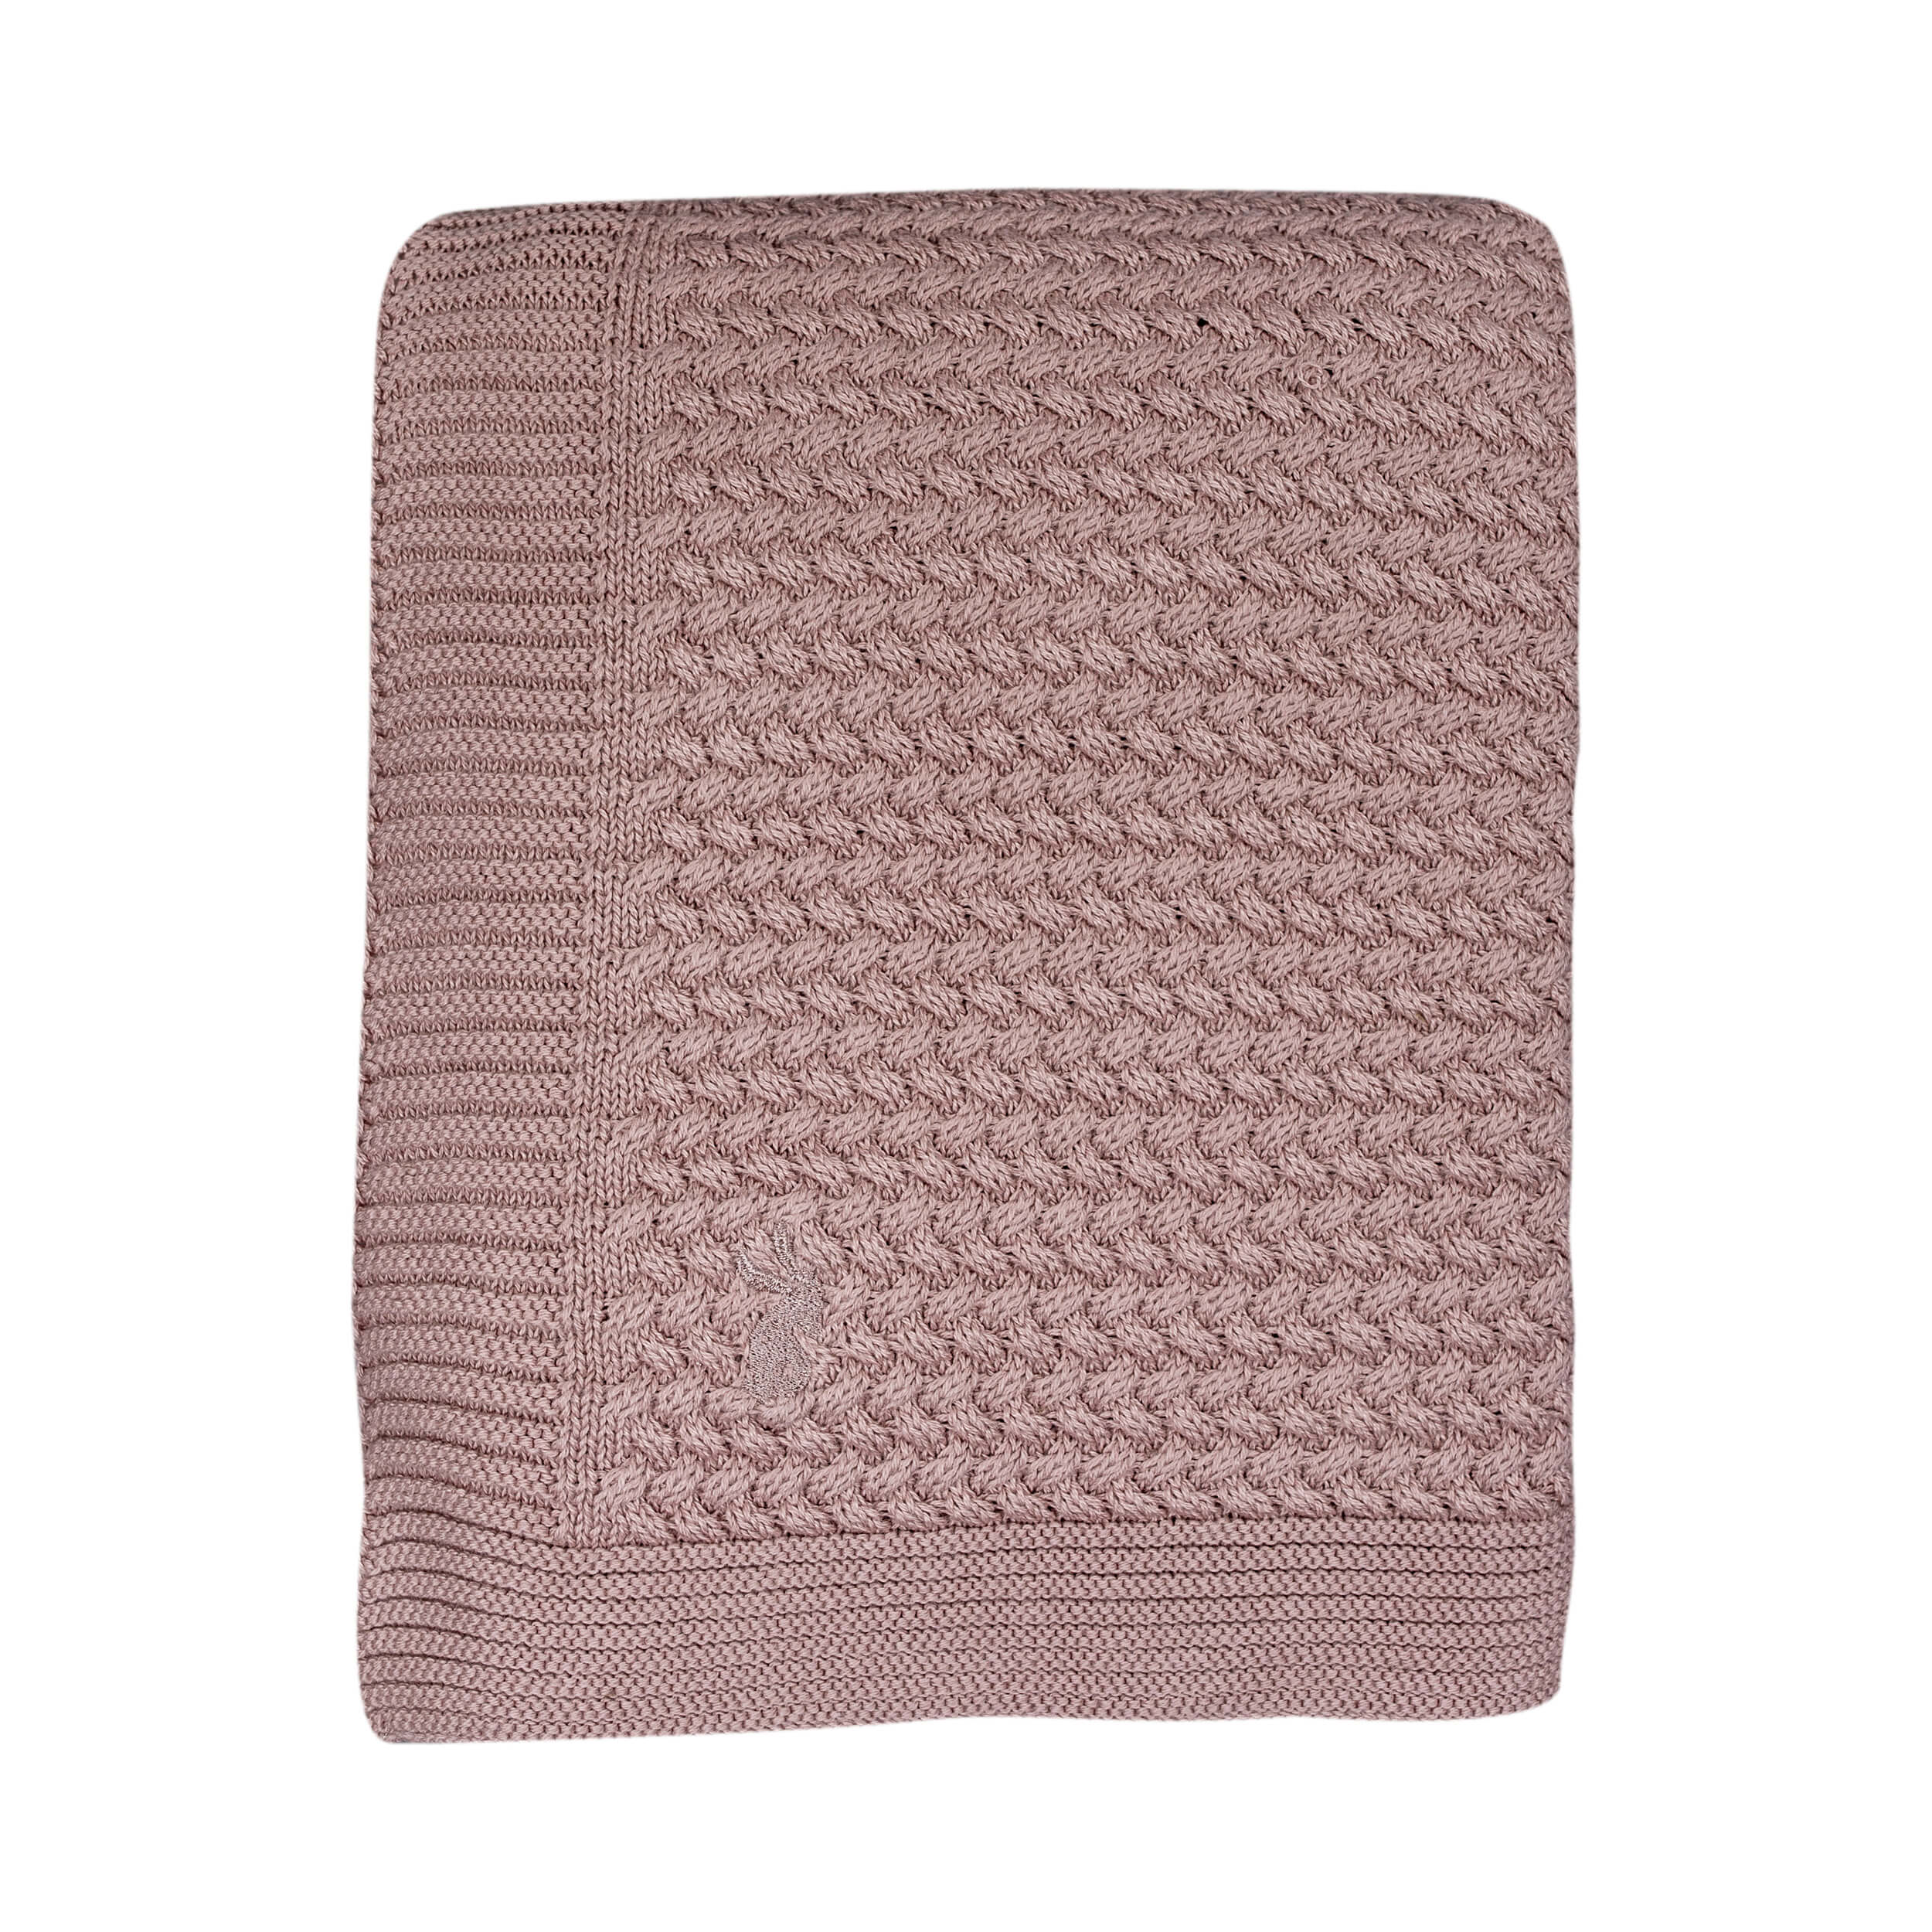 Deken Baby Ledikant.Soft Knitted Blanket Big Pale Pink